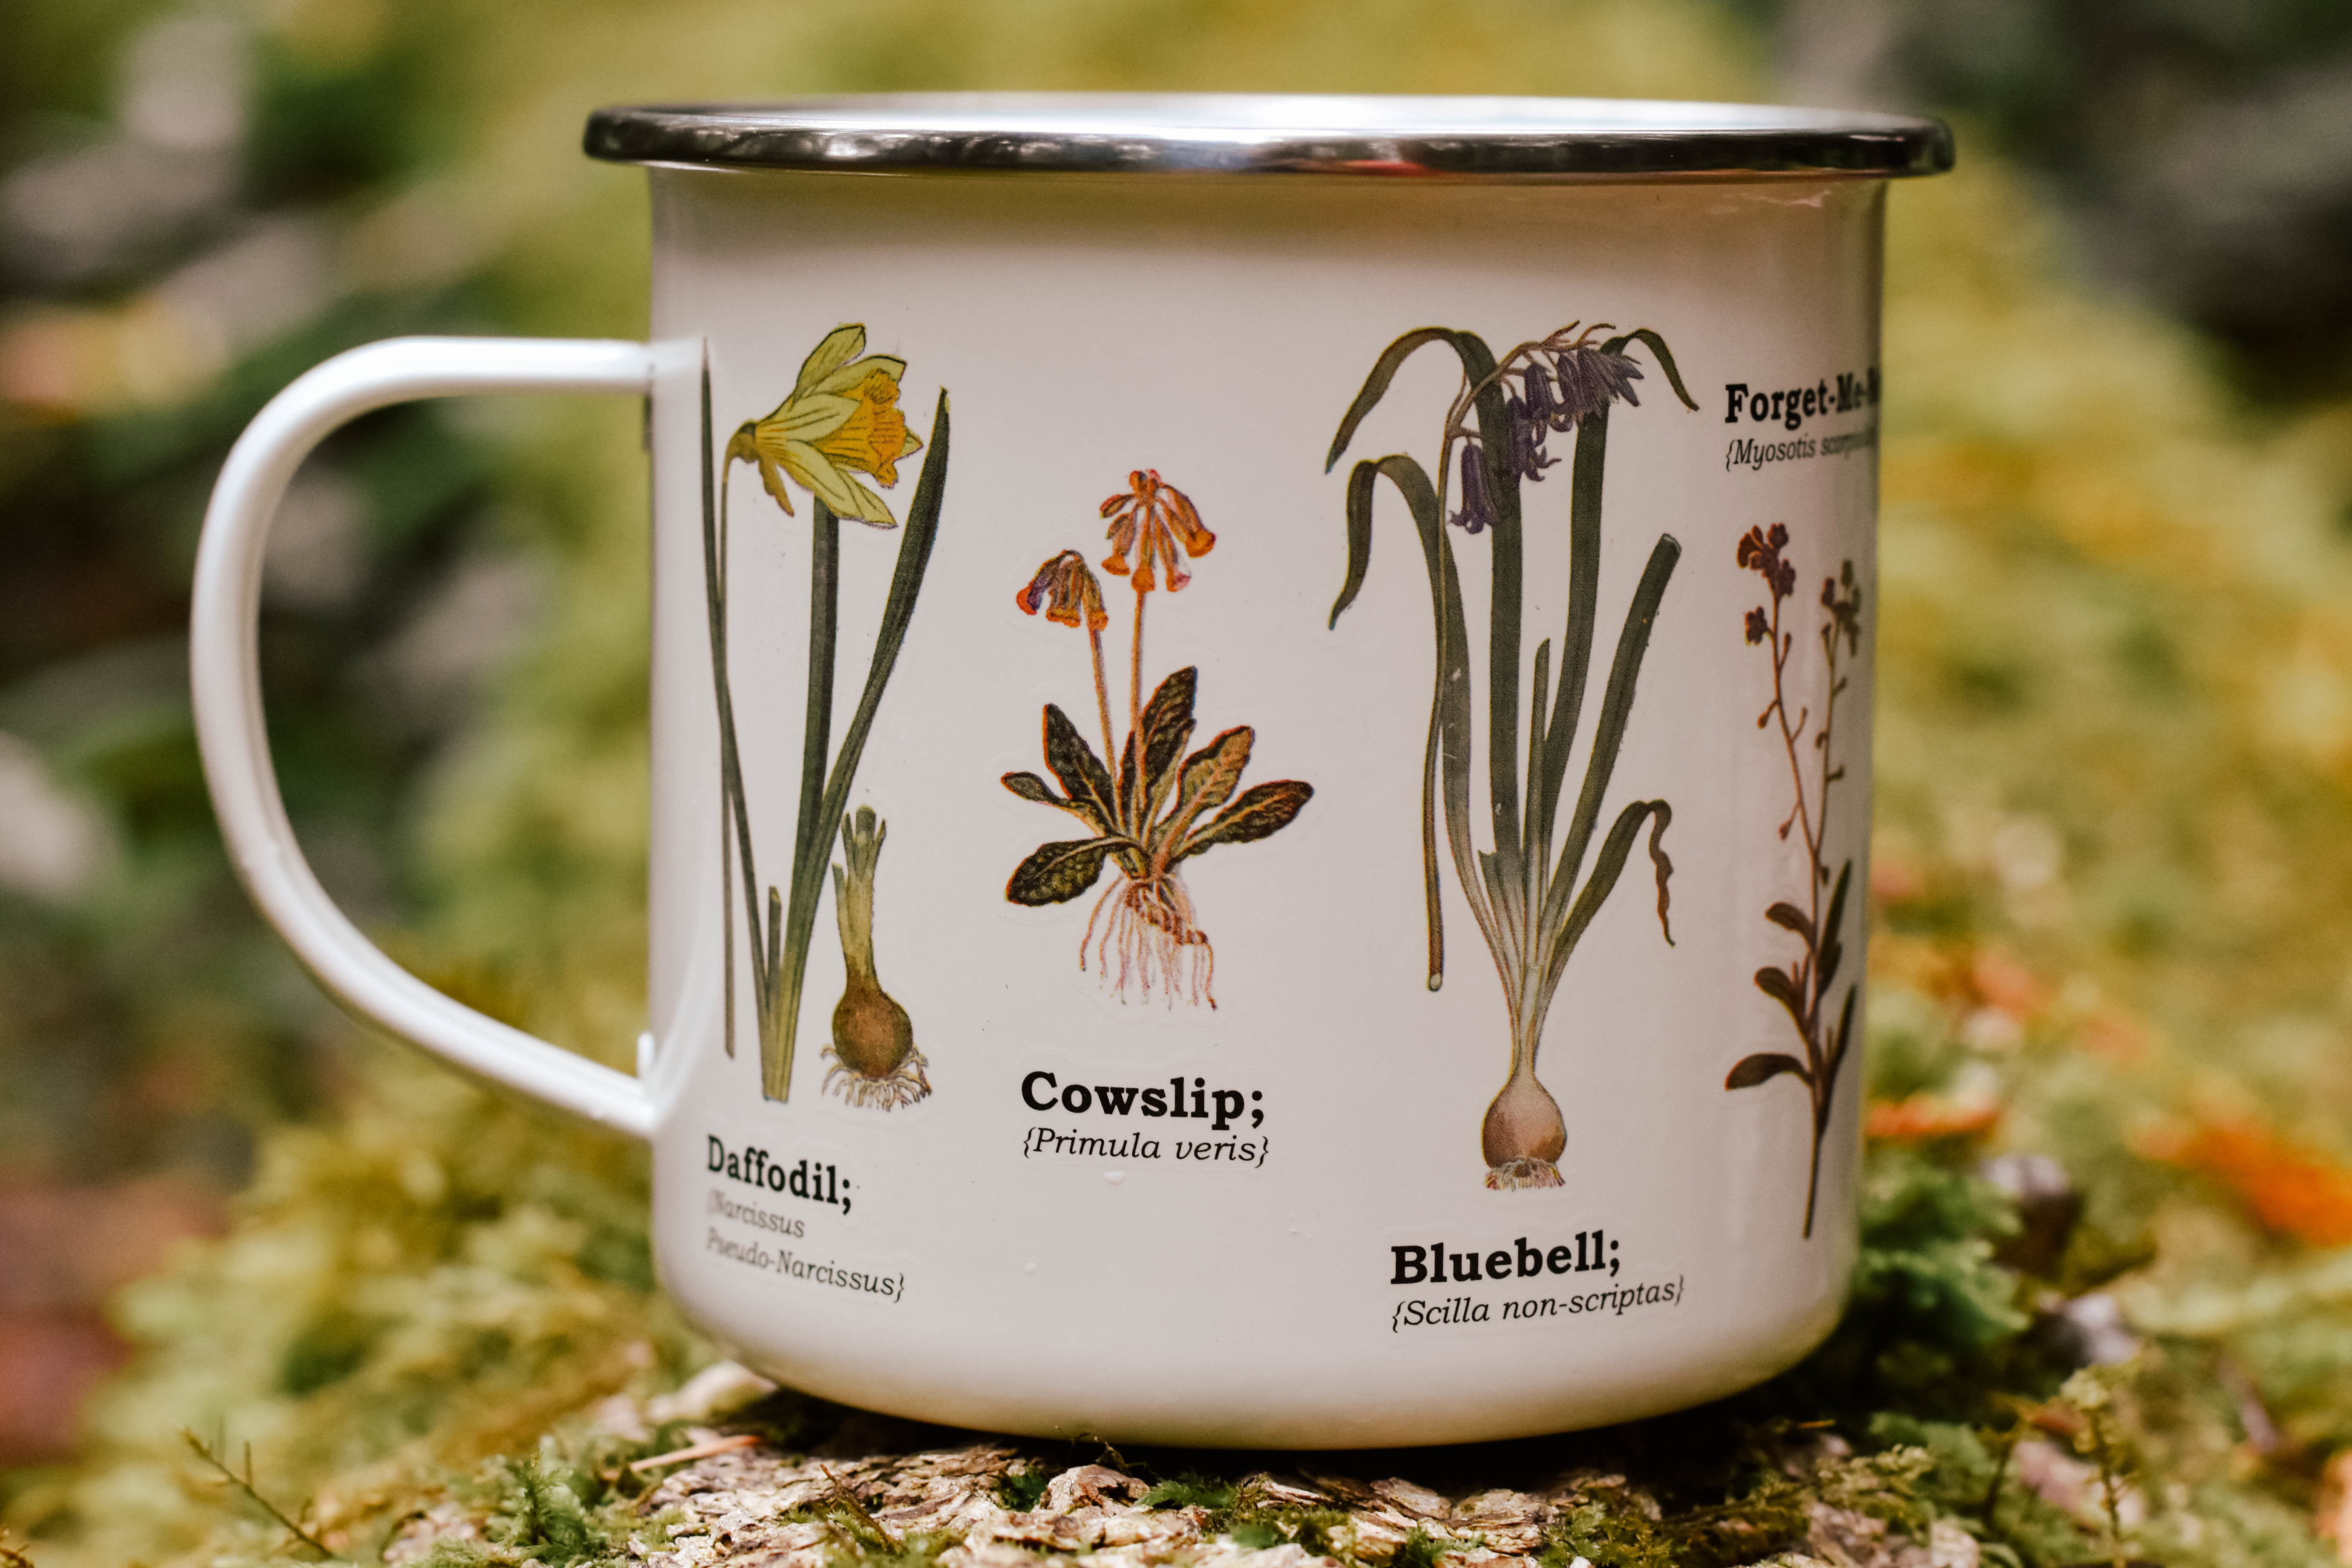 wild flower enamel mug 6Z6XTFREGFFVW